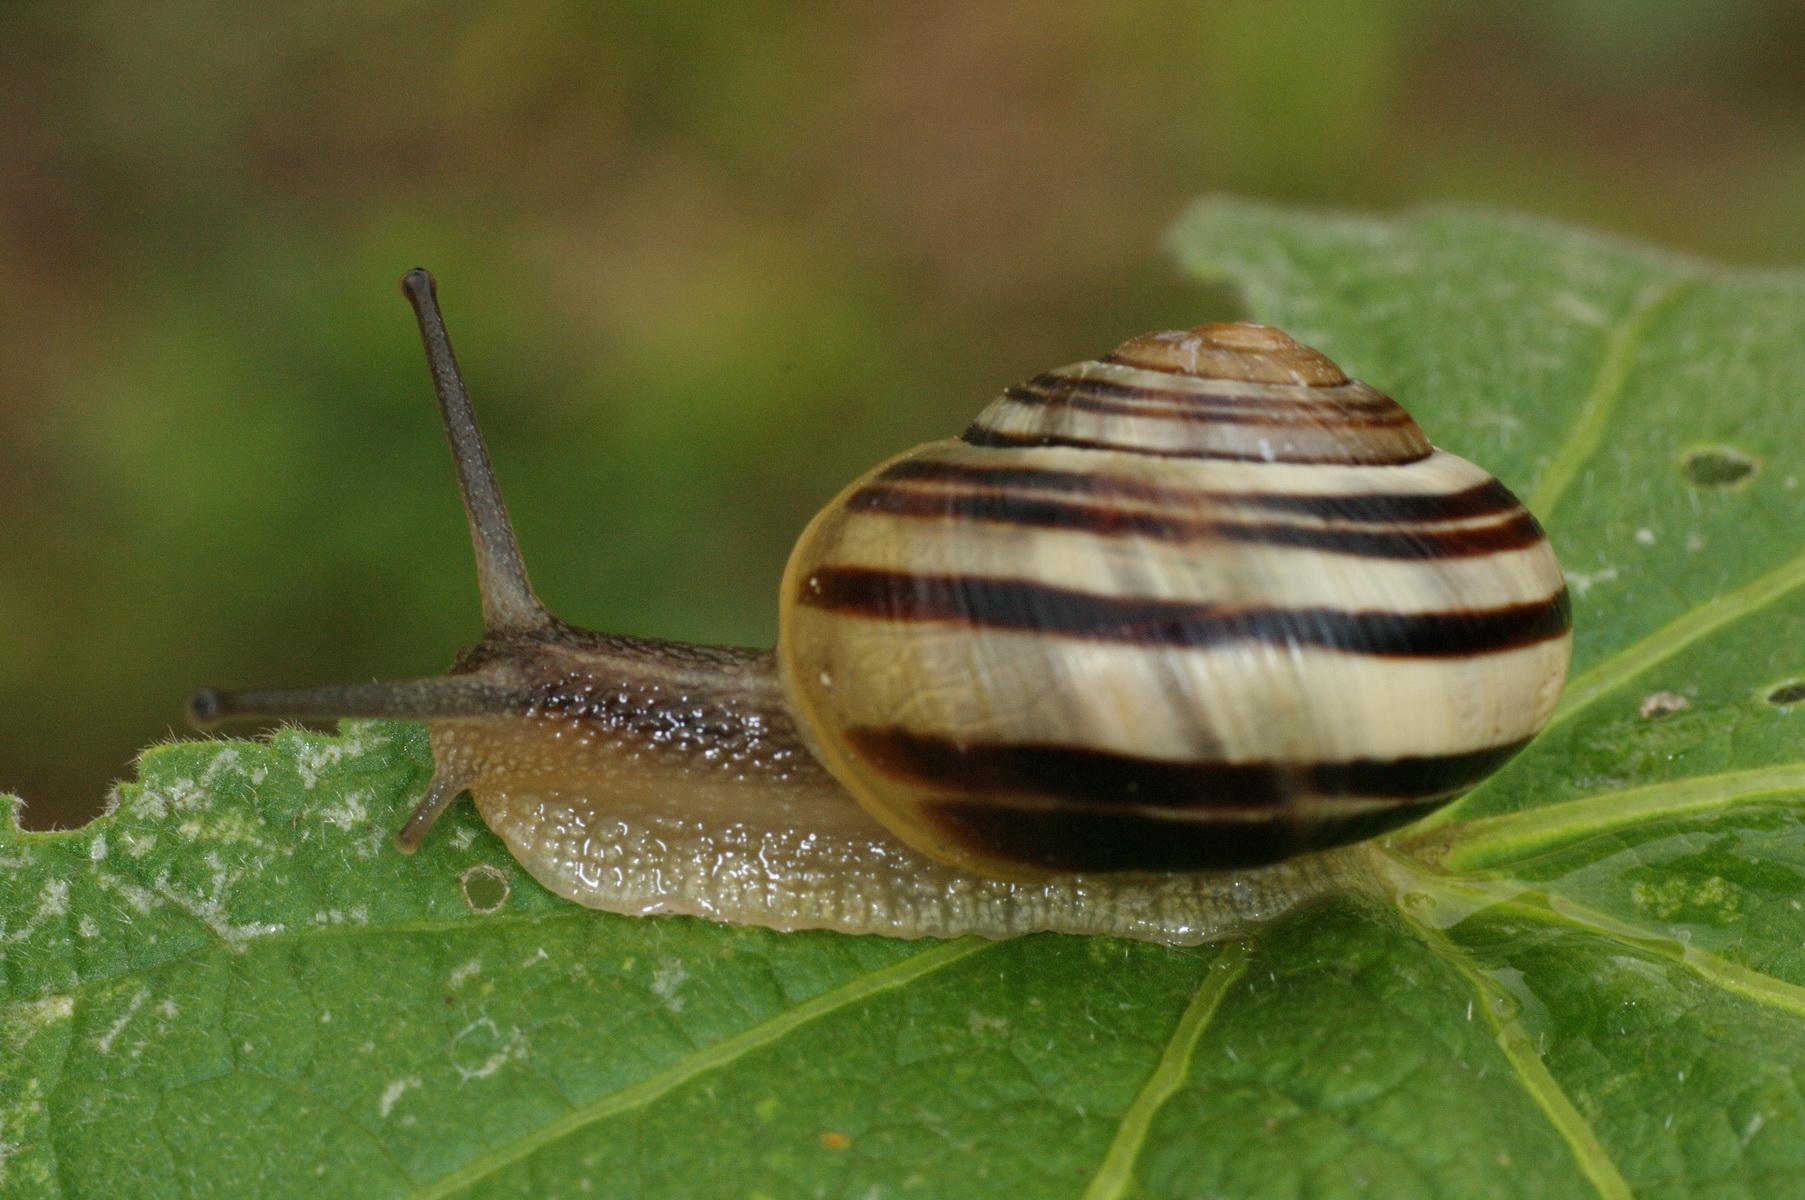 File:Cepaea hortensis 01 THWZ.jpg - Wikimedia Commons